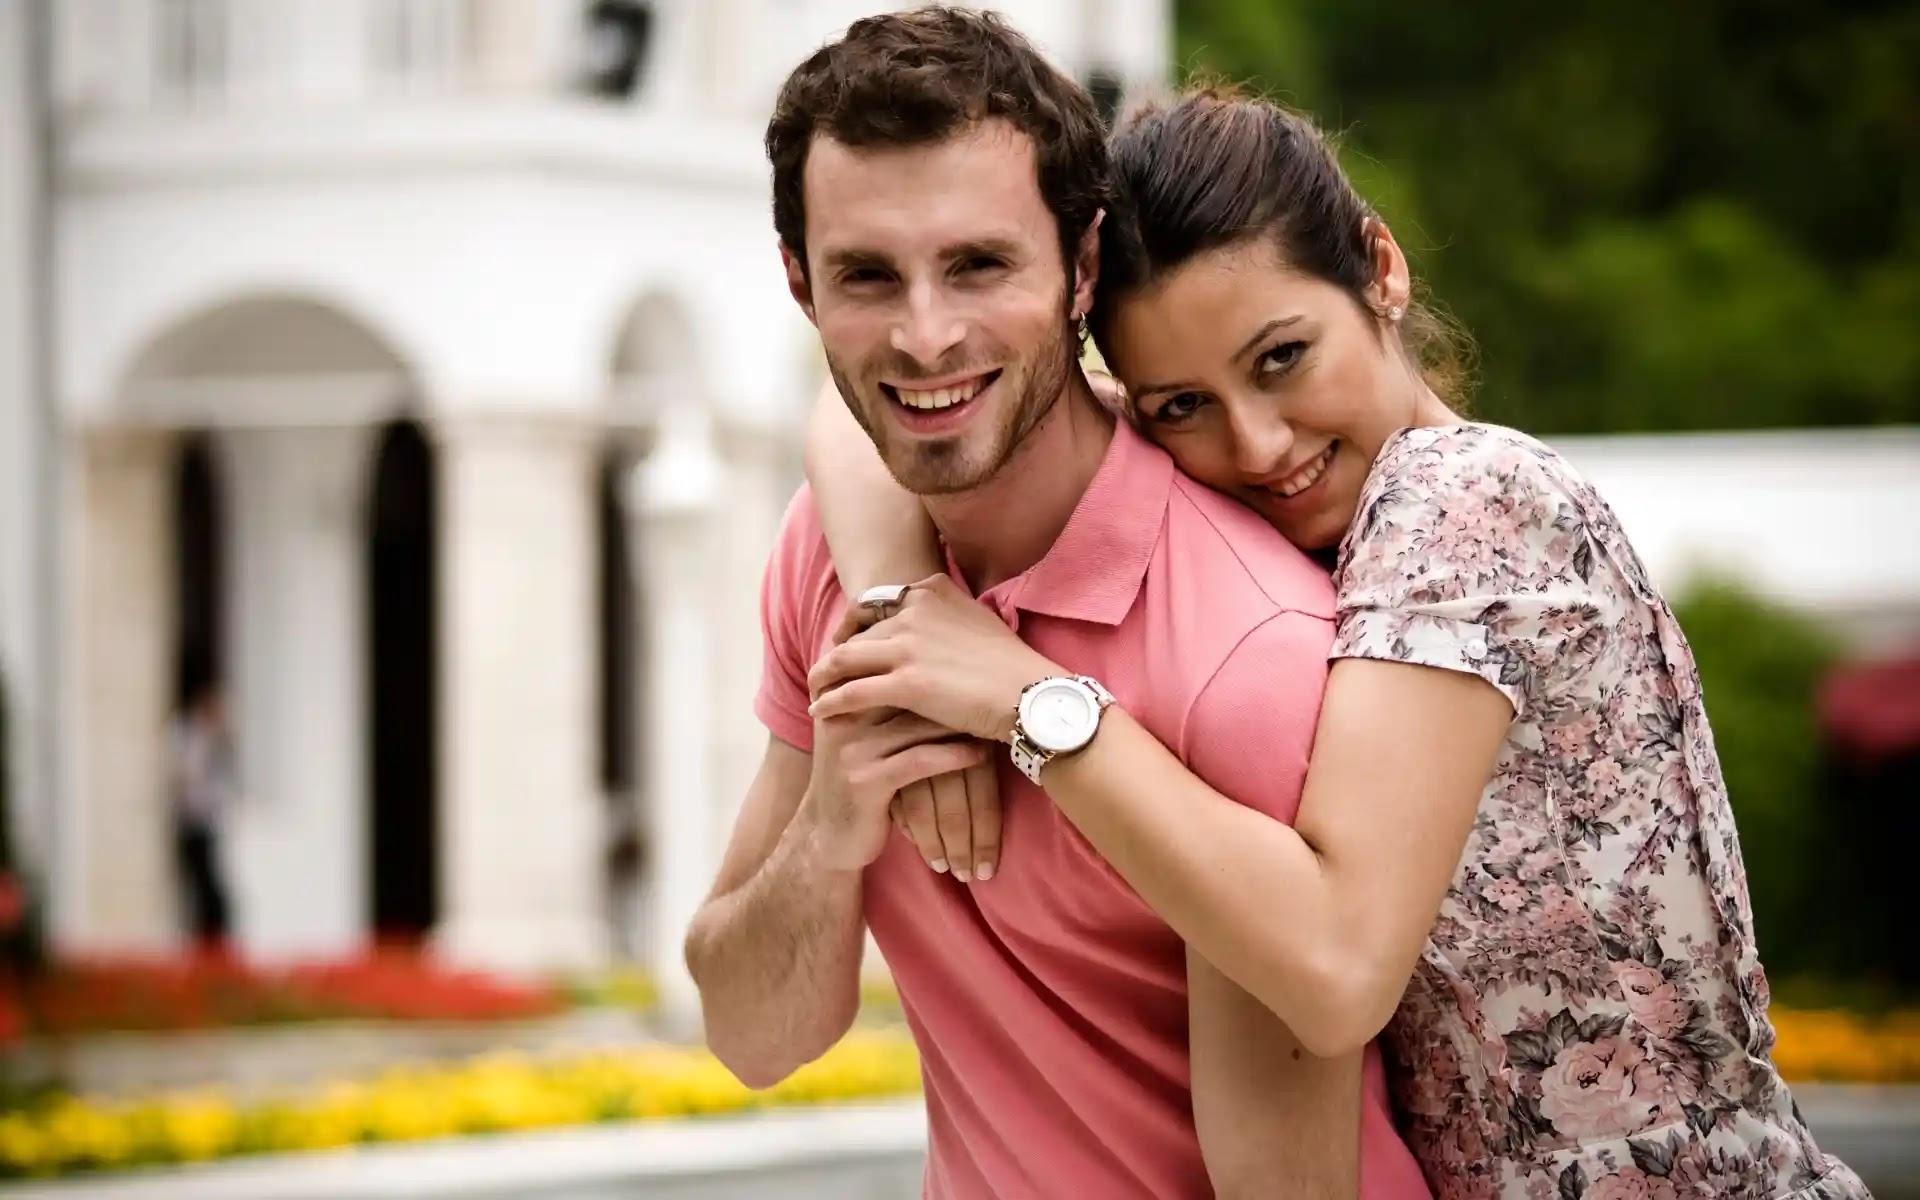 sweet love couple image